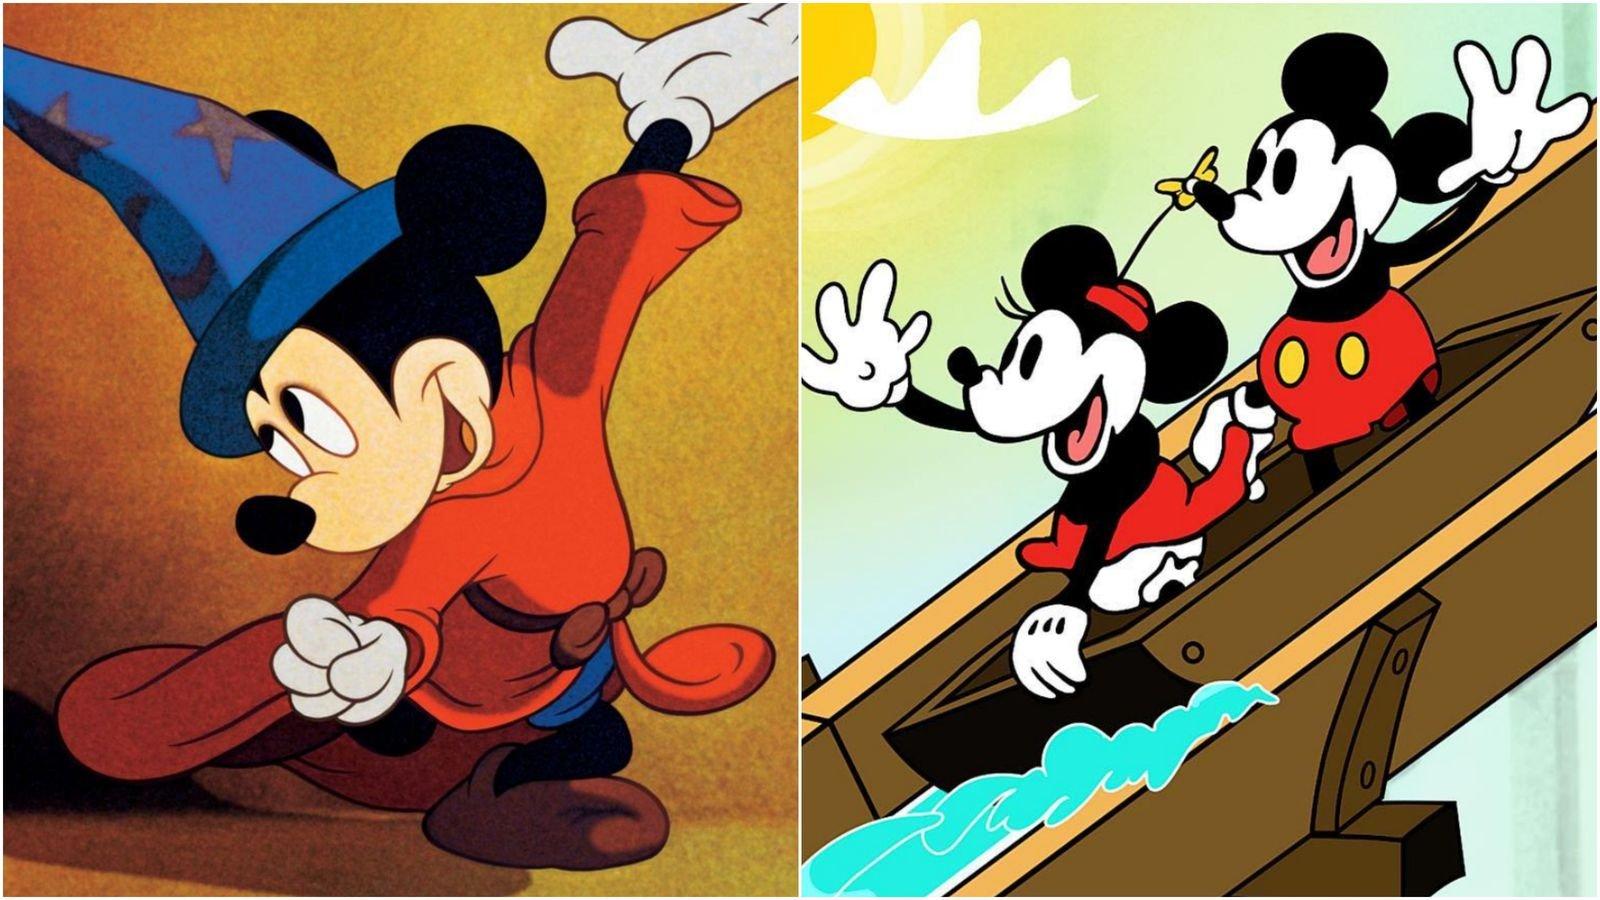 img 5bd8e2255a26c.png?resize=648,365 - 【米奇90週年】關於迪士尼米老鼠的10個秘密:他原本是隻兔子,跟米妮竟然是「這個」關係!